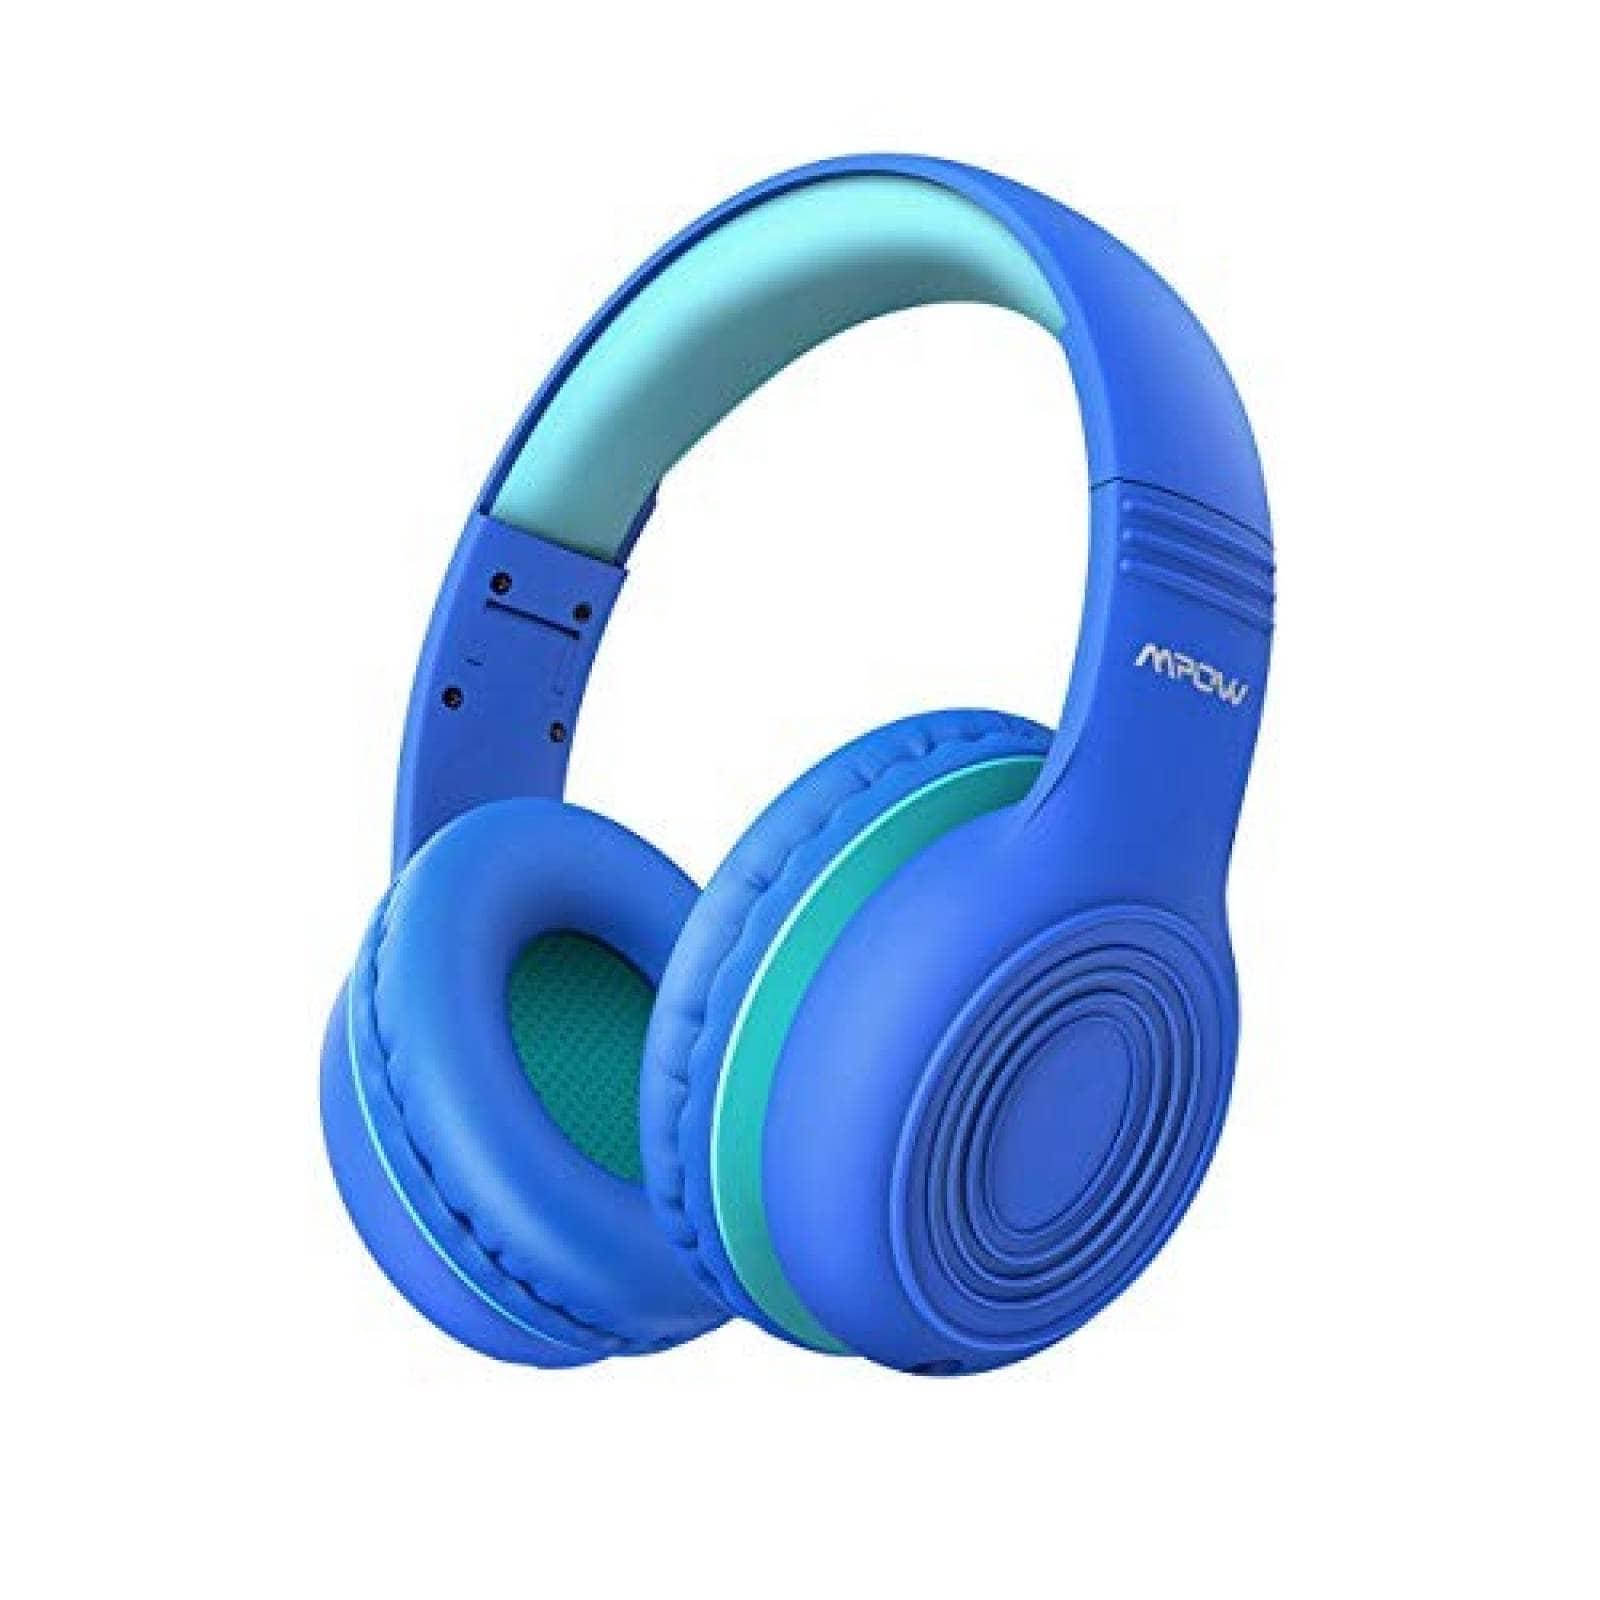 Audífonos diadema plegables Mpow para niños con mic -azul